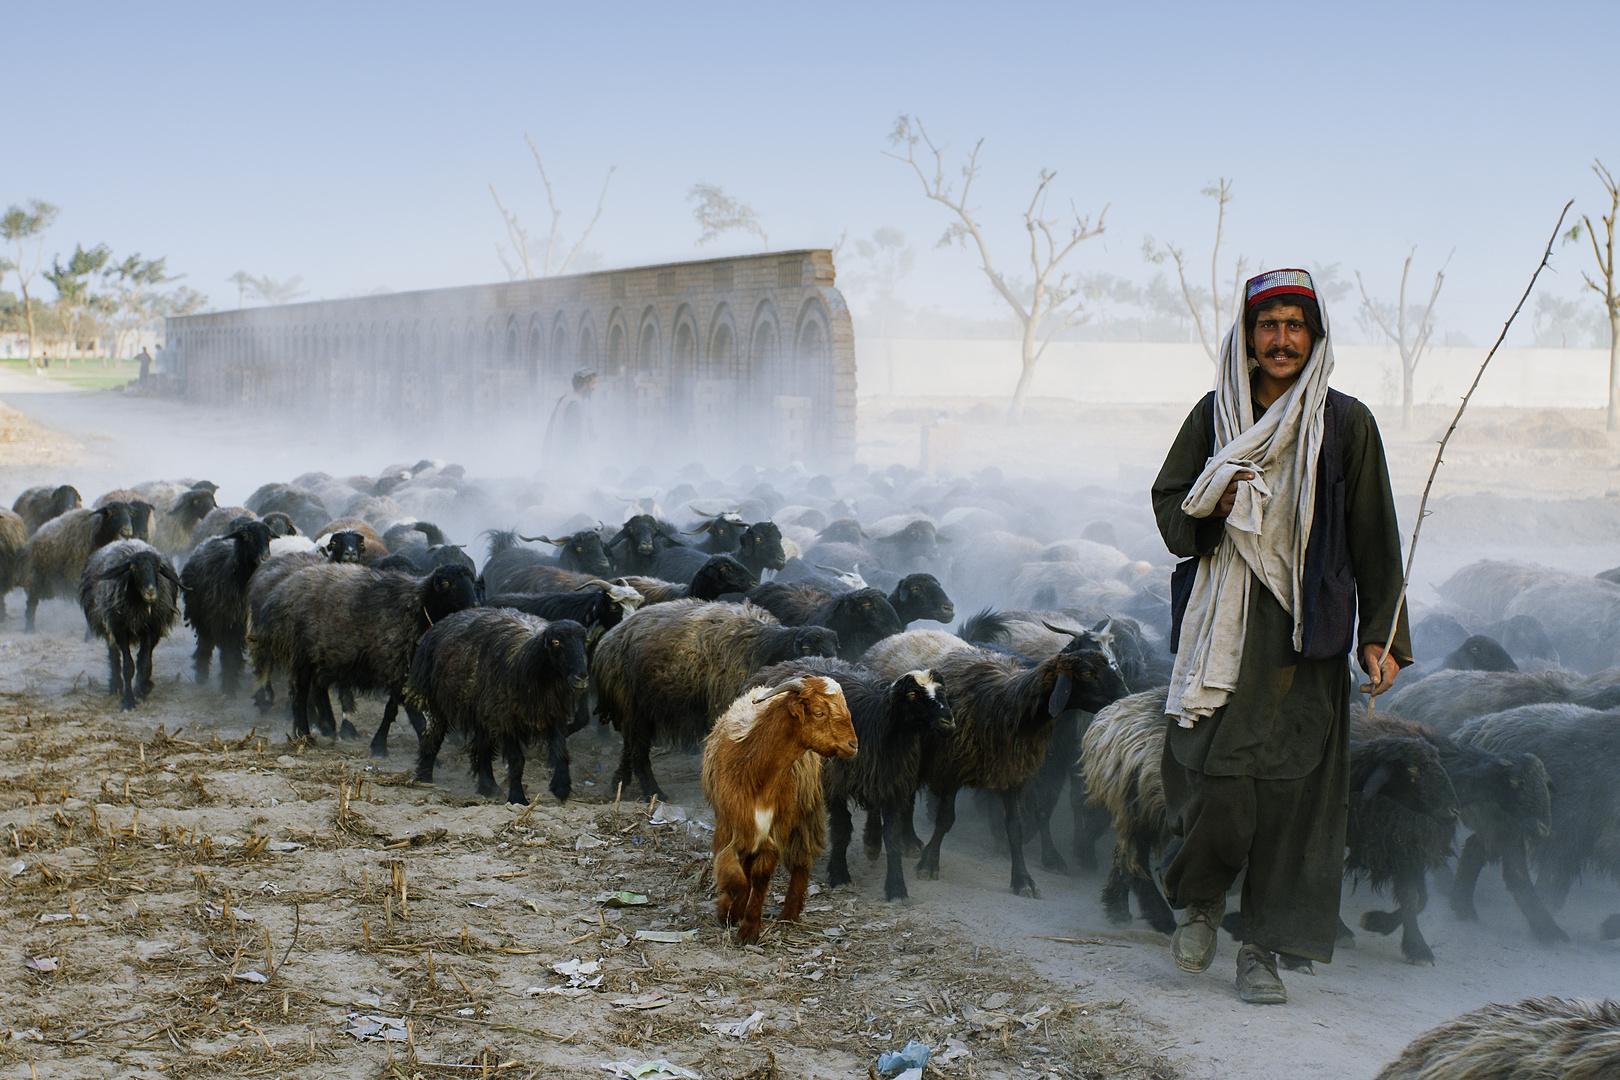 Shepherd with Goats on Rural Roads of Layyah,Pakistan